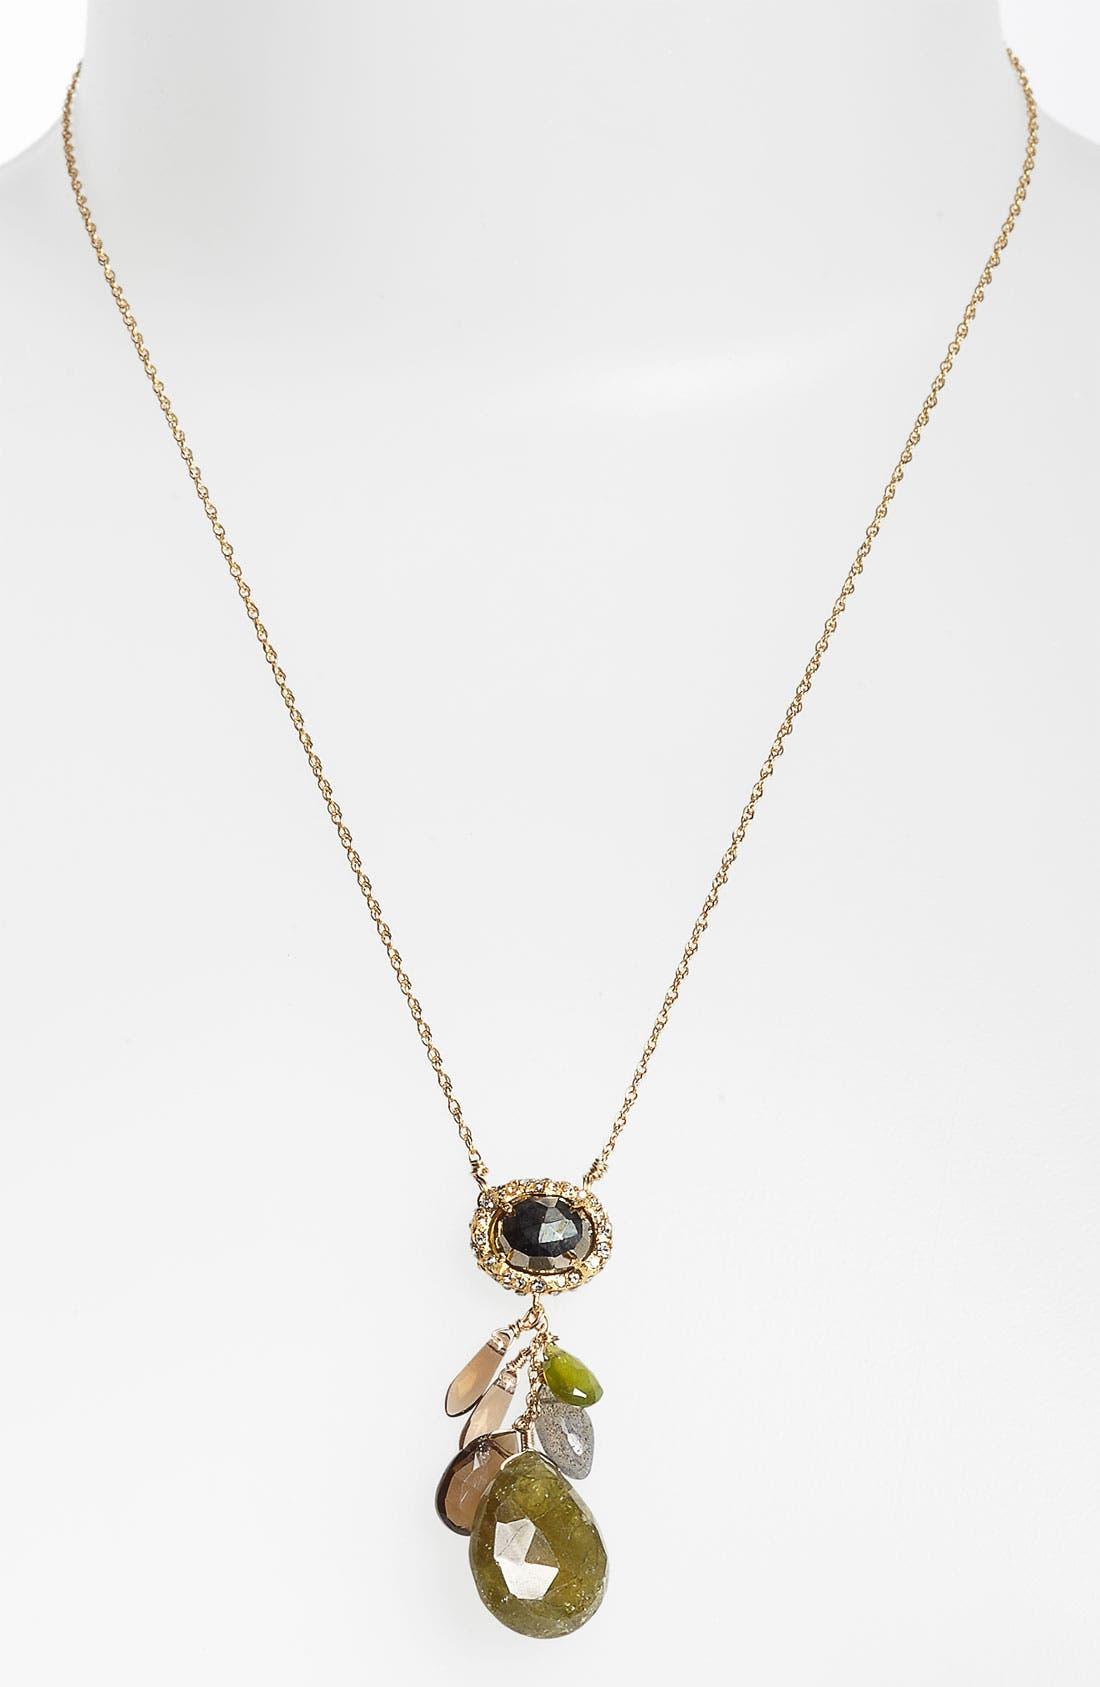 Main Image - Alexis Bittar 'Elements - Siyabona' Cluster Pendant Necklace